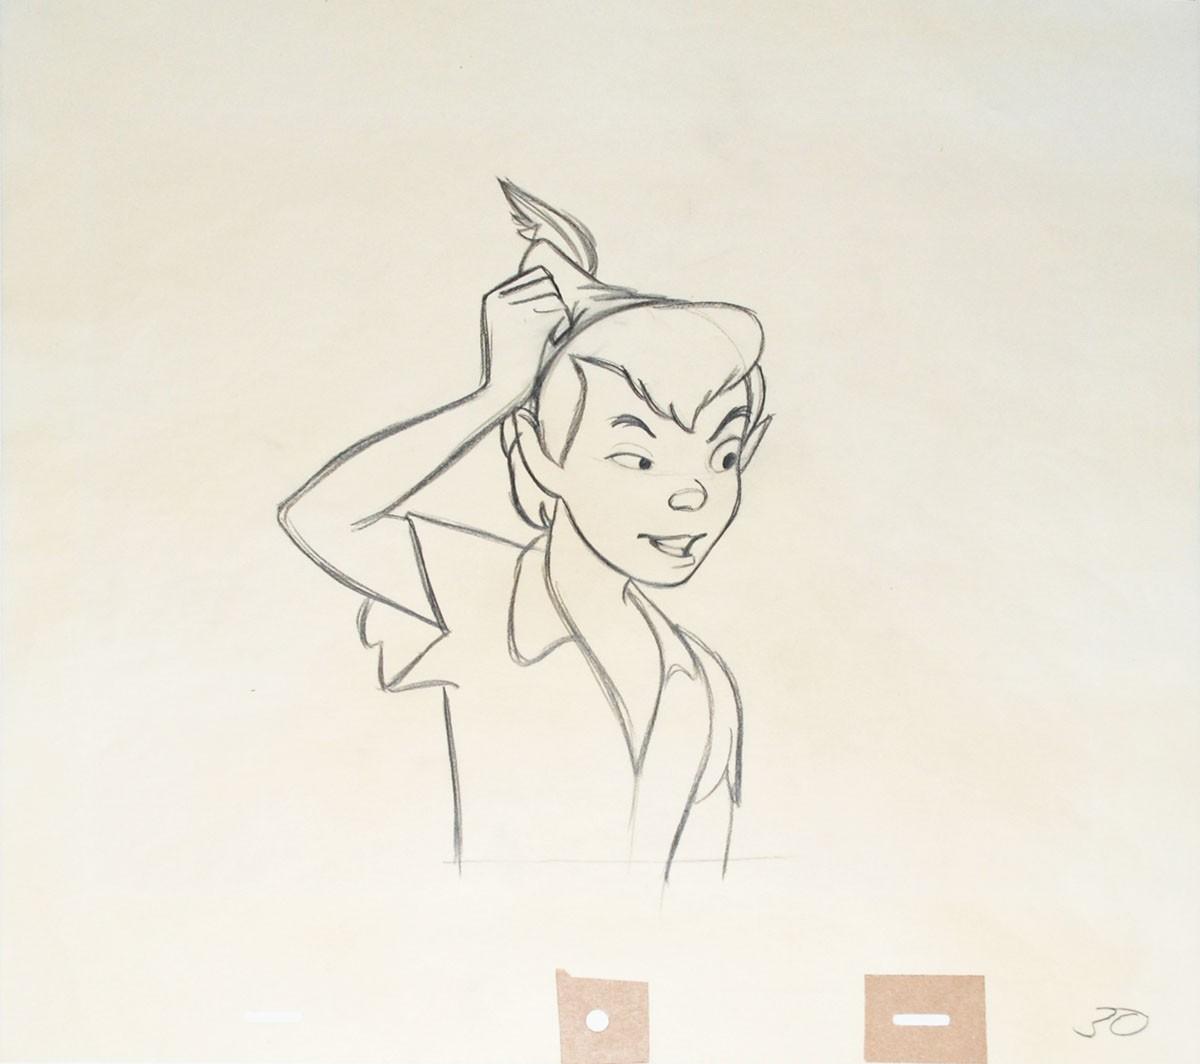 1200x1064 Original Walt Disney Production Drawing From Peter Pan Featuring